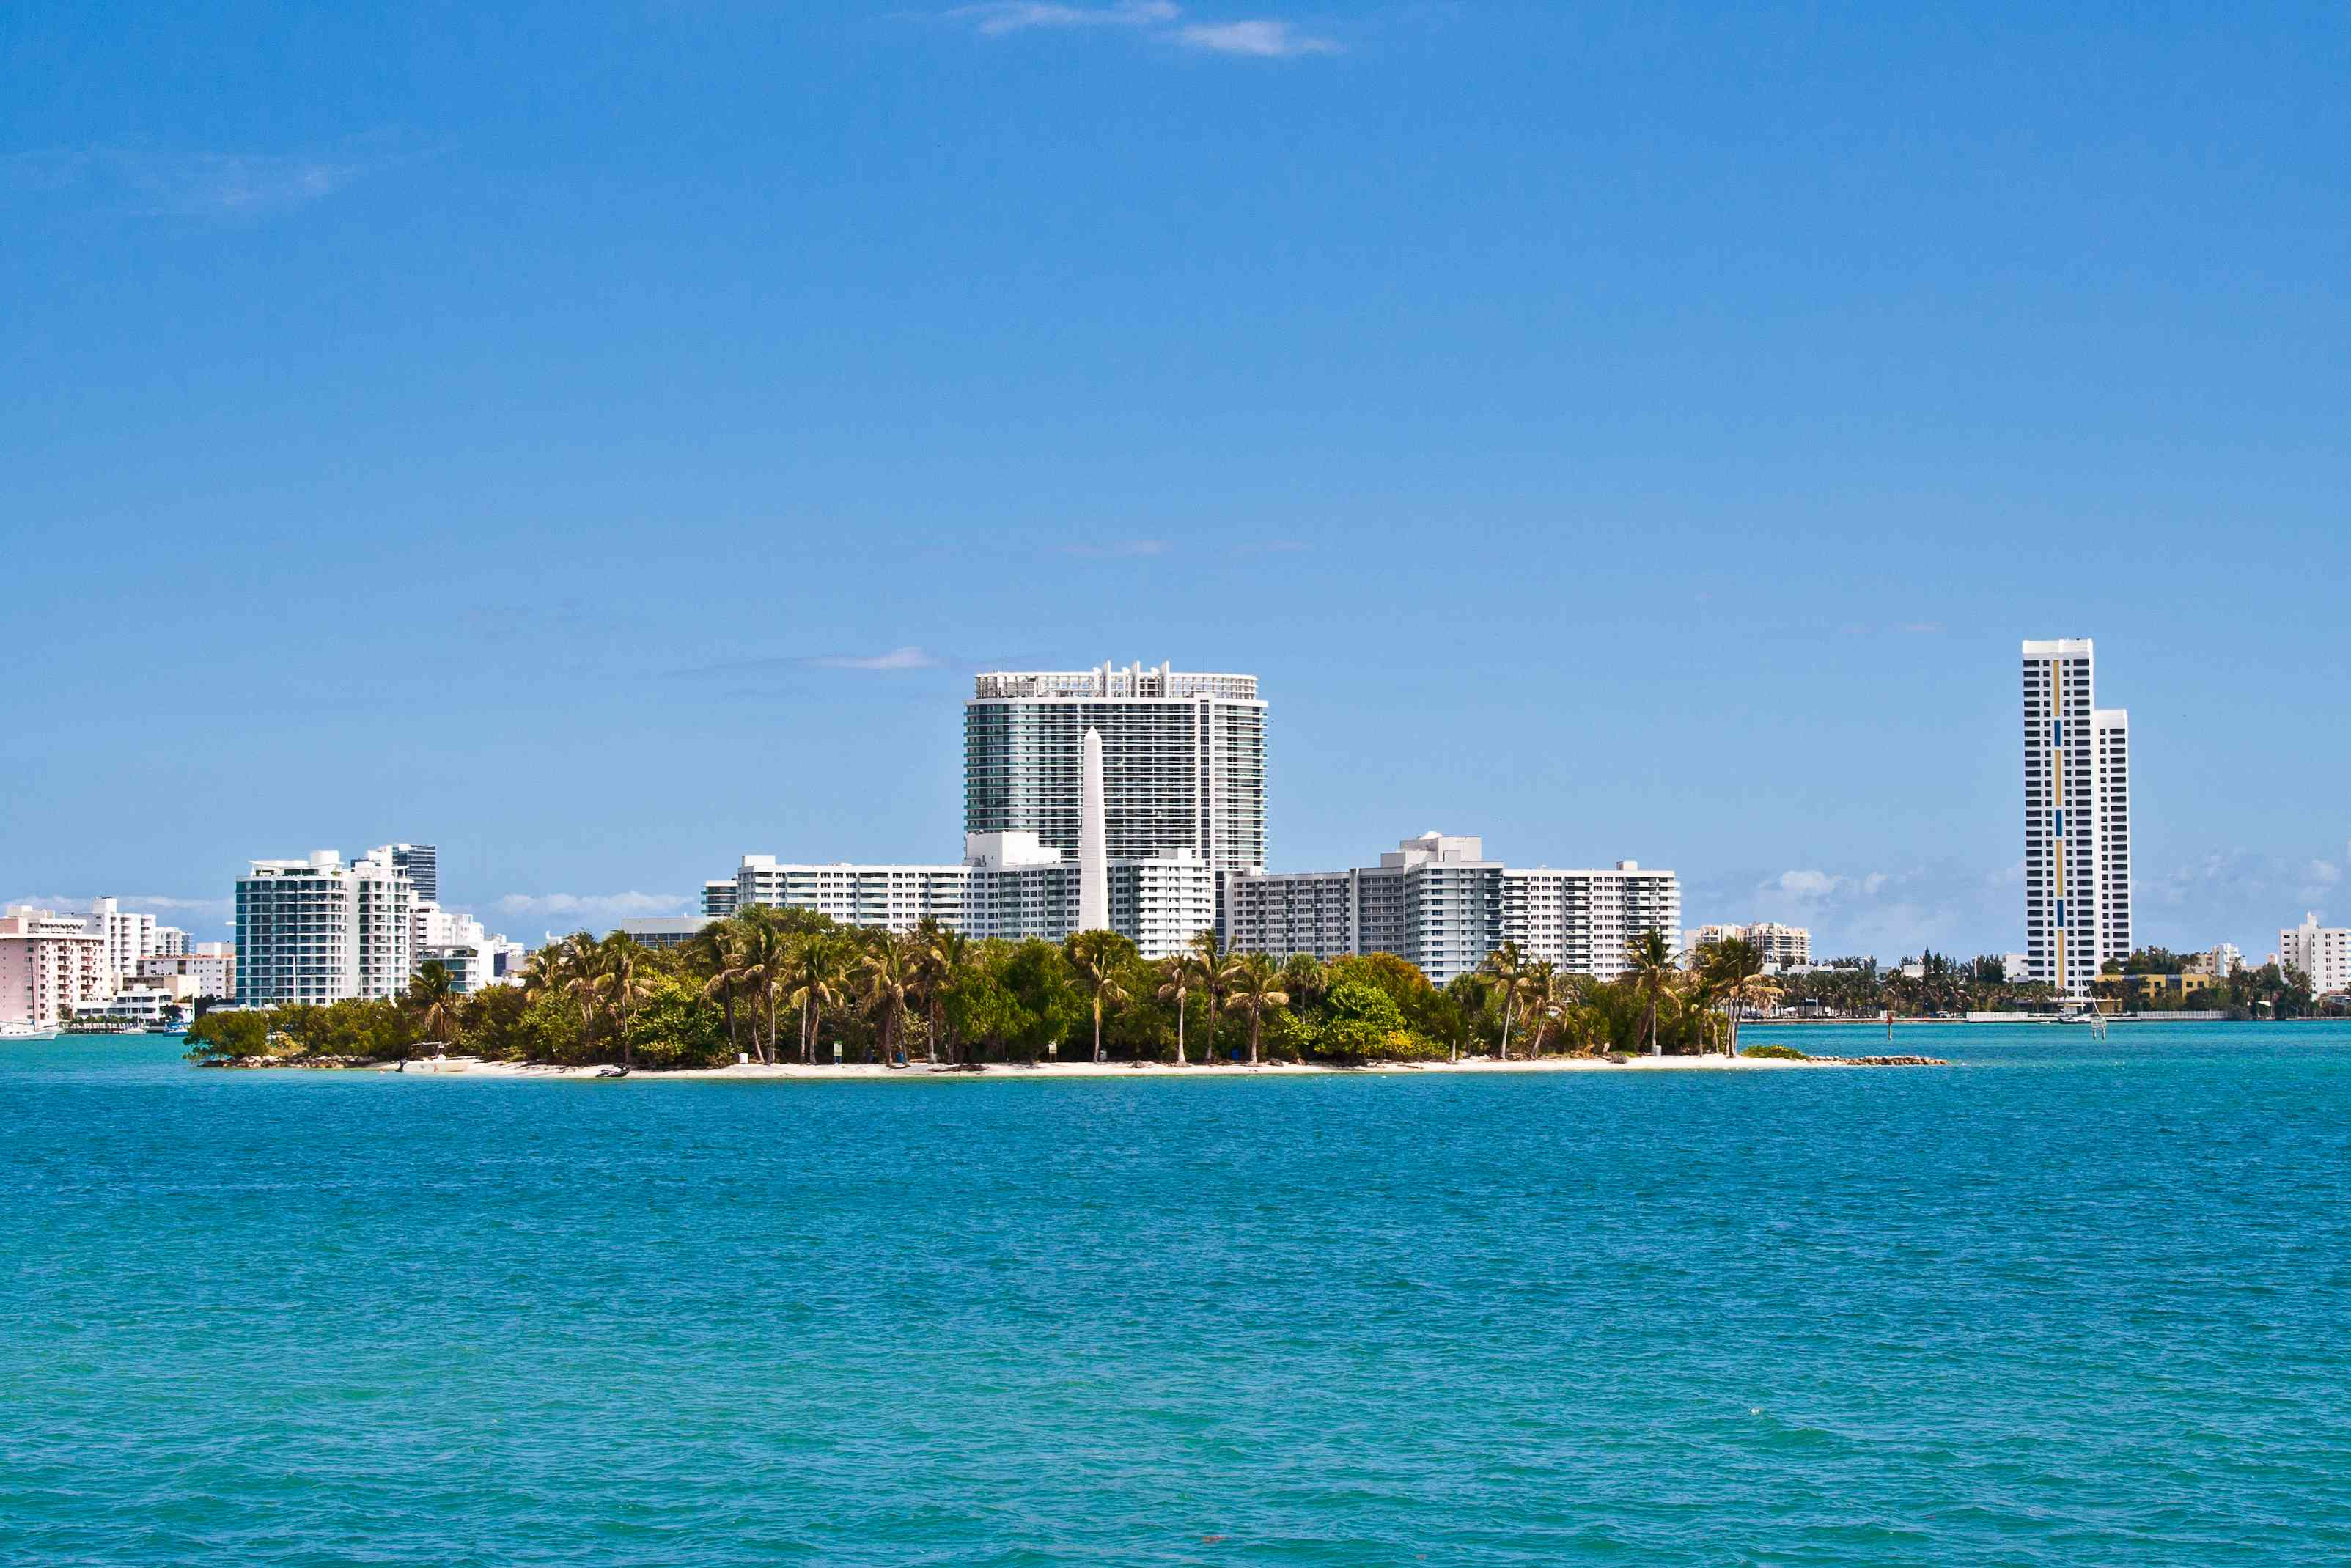 Flagler Monument Island in Miami, Biscayne Bay